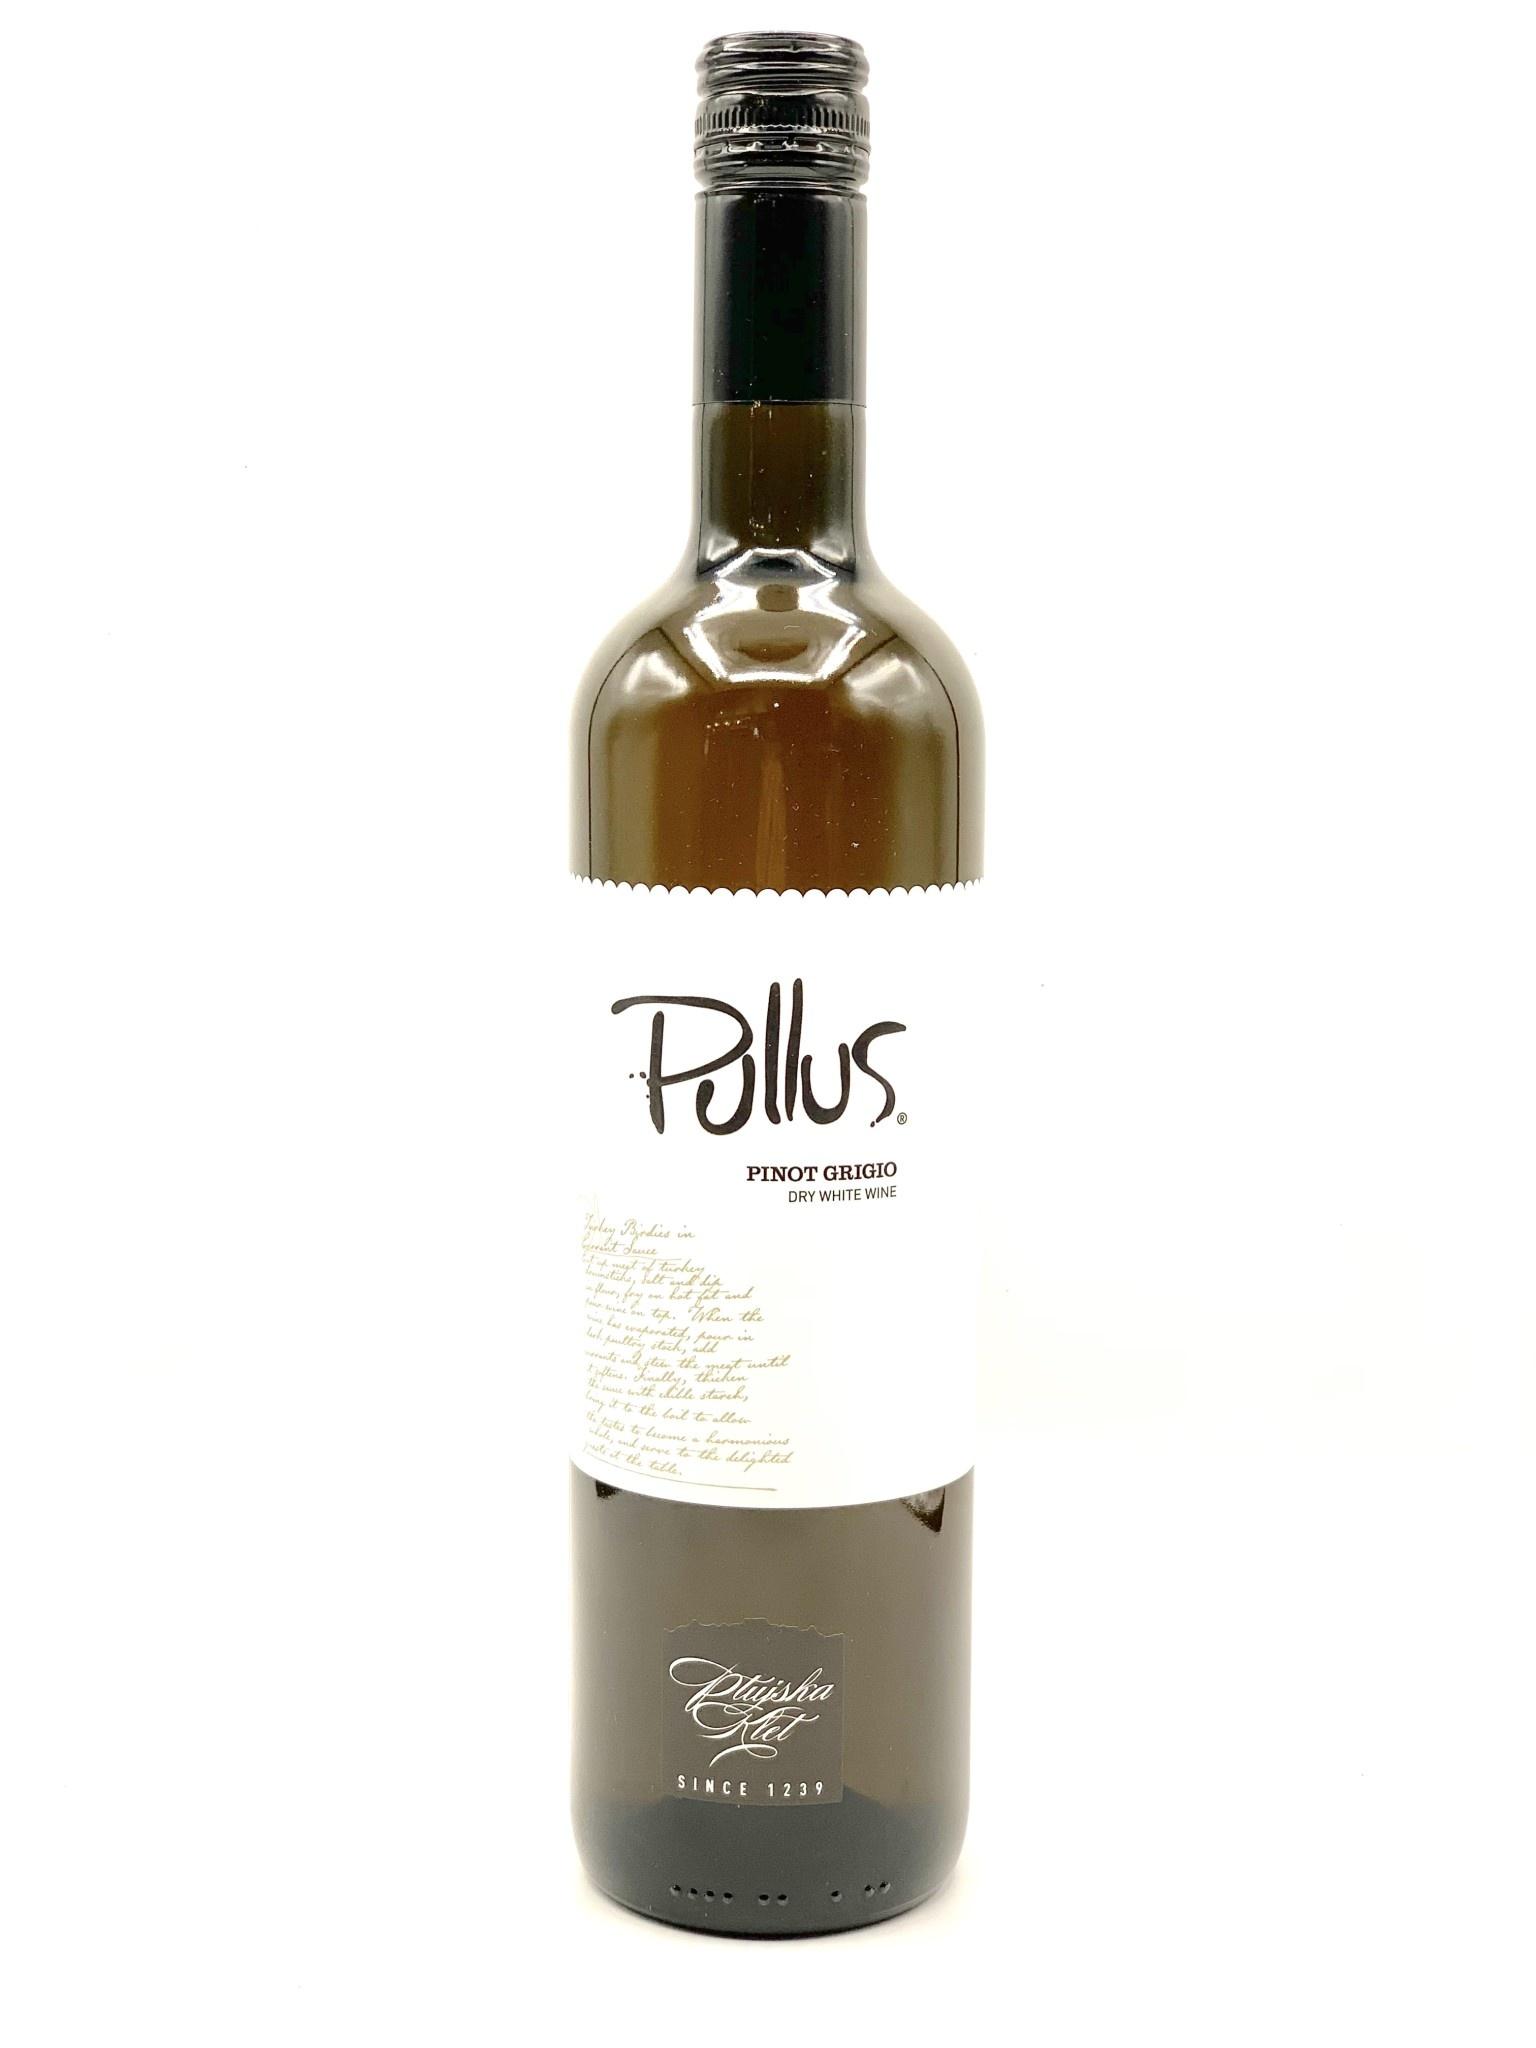 "Slovenia Pinot Grigio 2019/20 Ptujsk Klet ""Pullus"" 750ml"